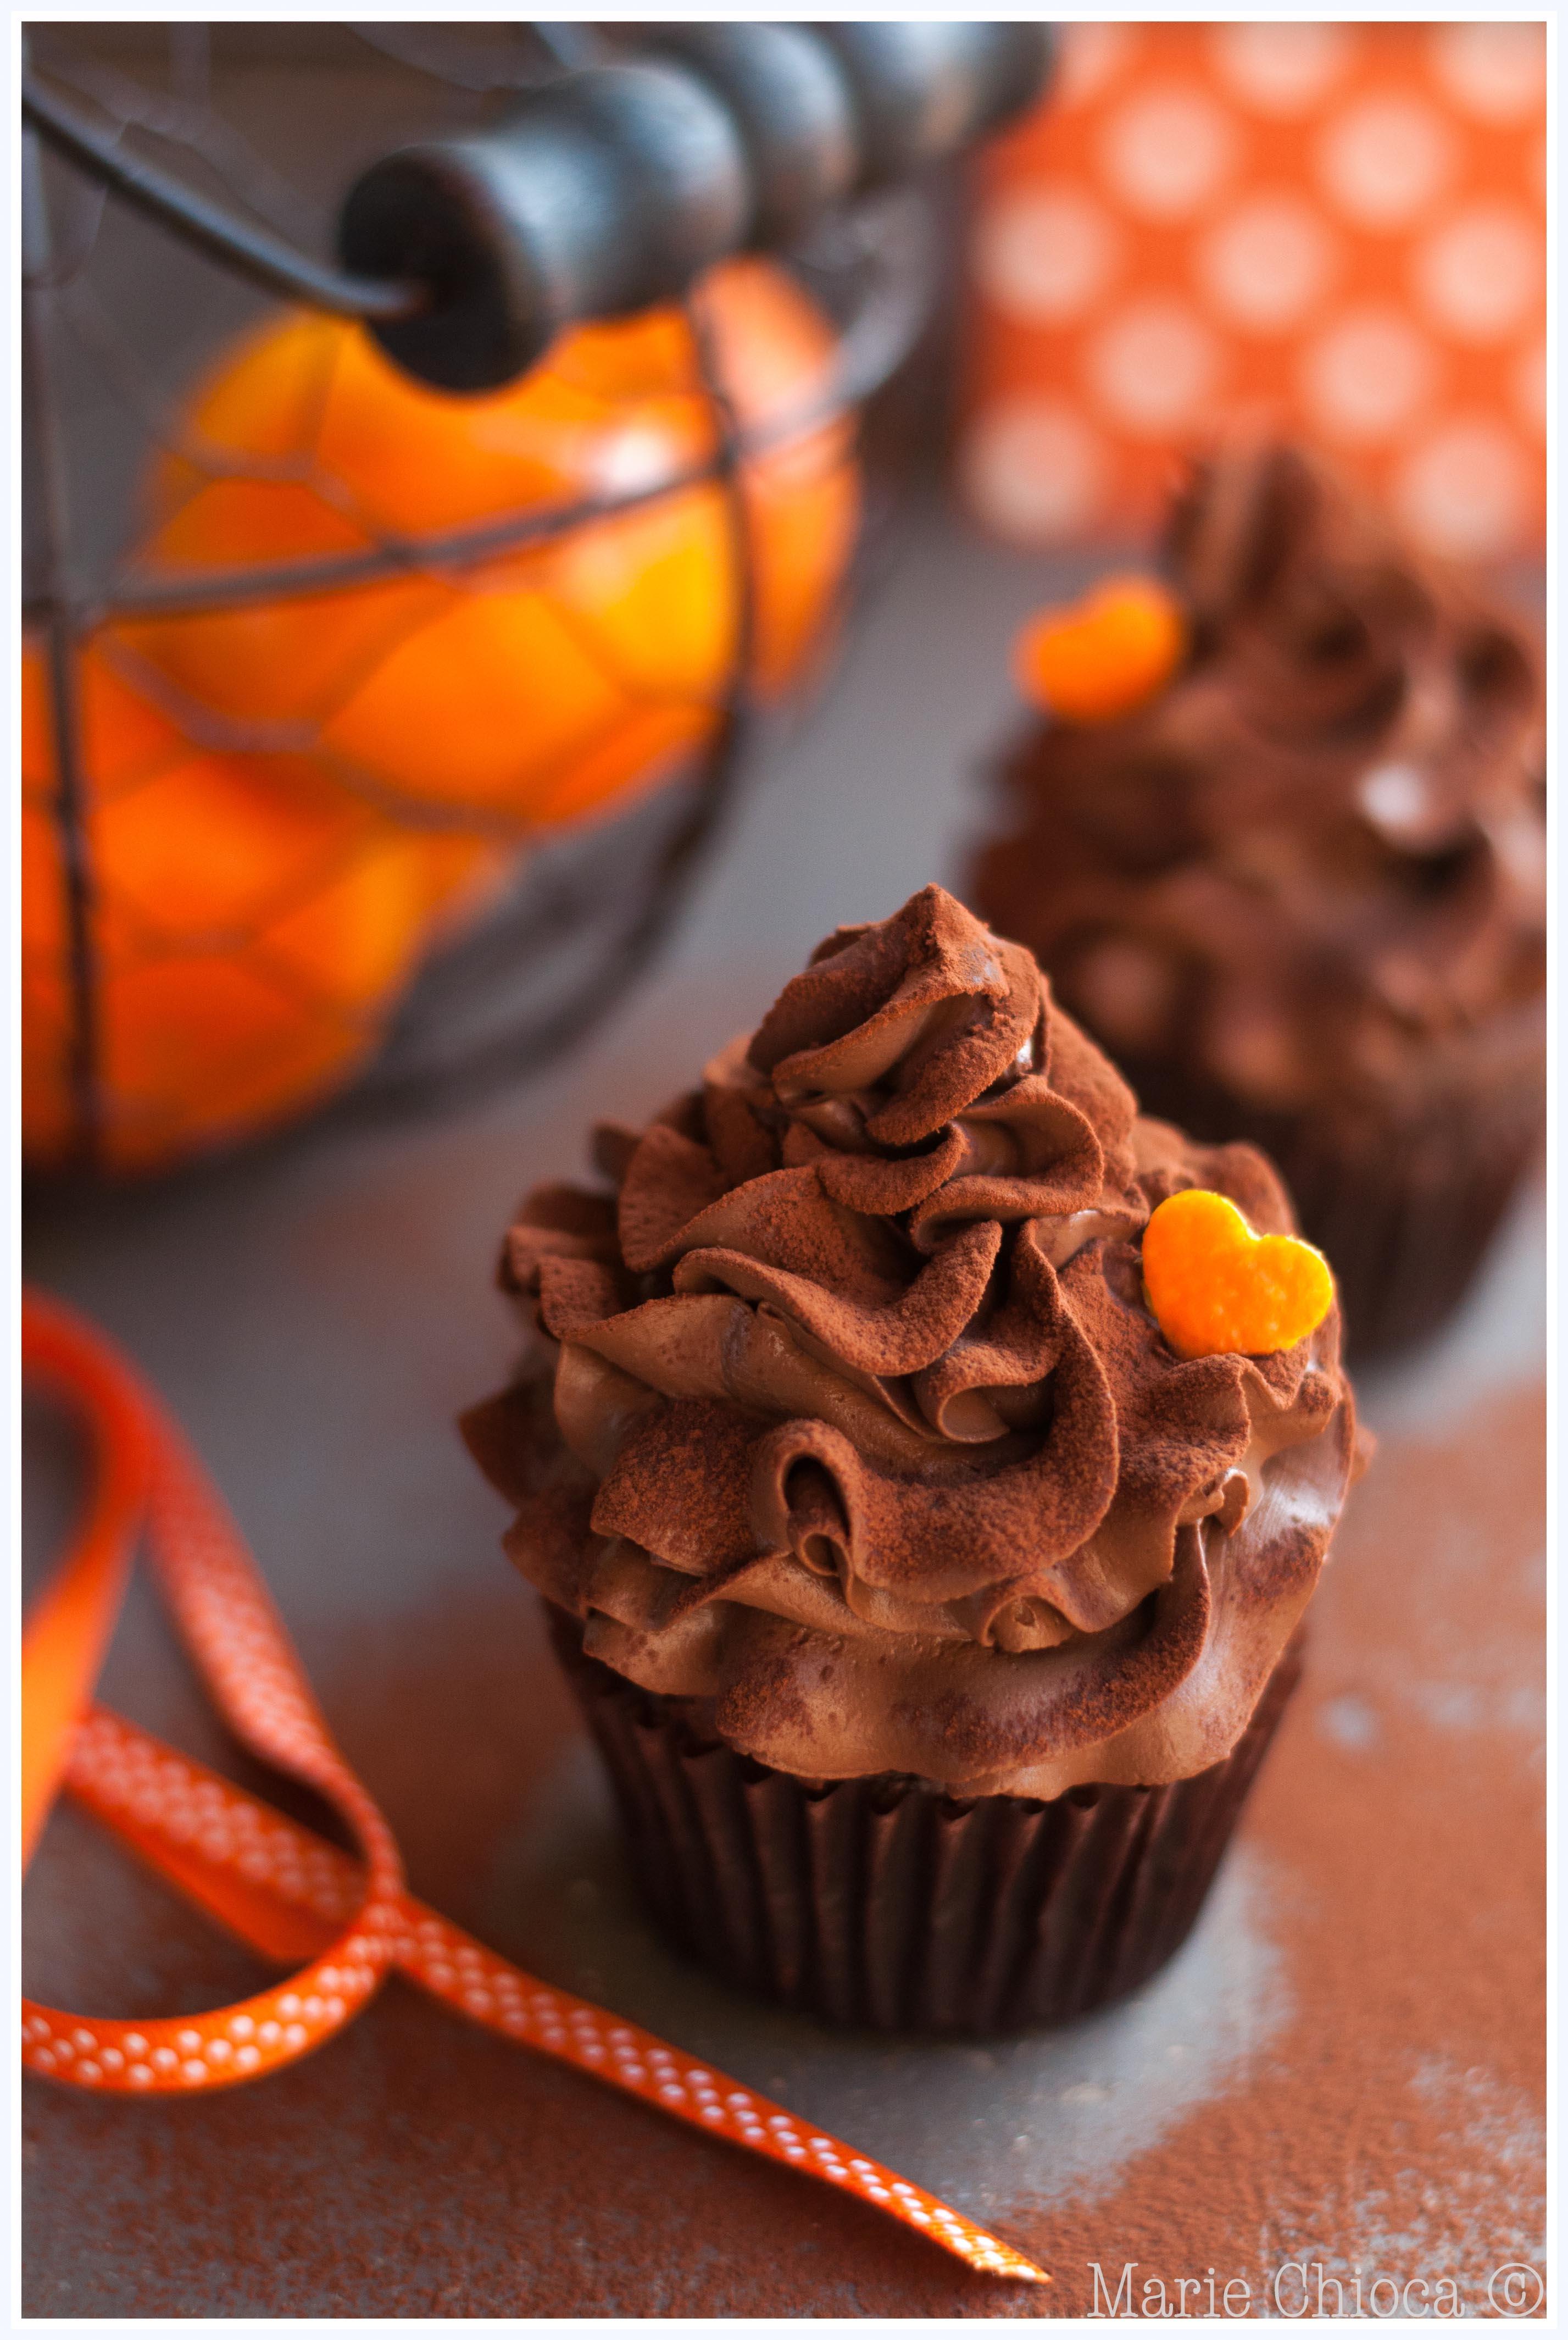 23 Cupcakes chocolat-mandarine au Grand-Marnier 2-2-2